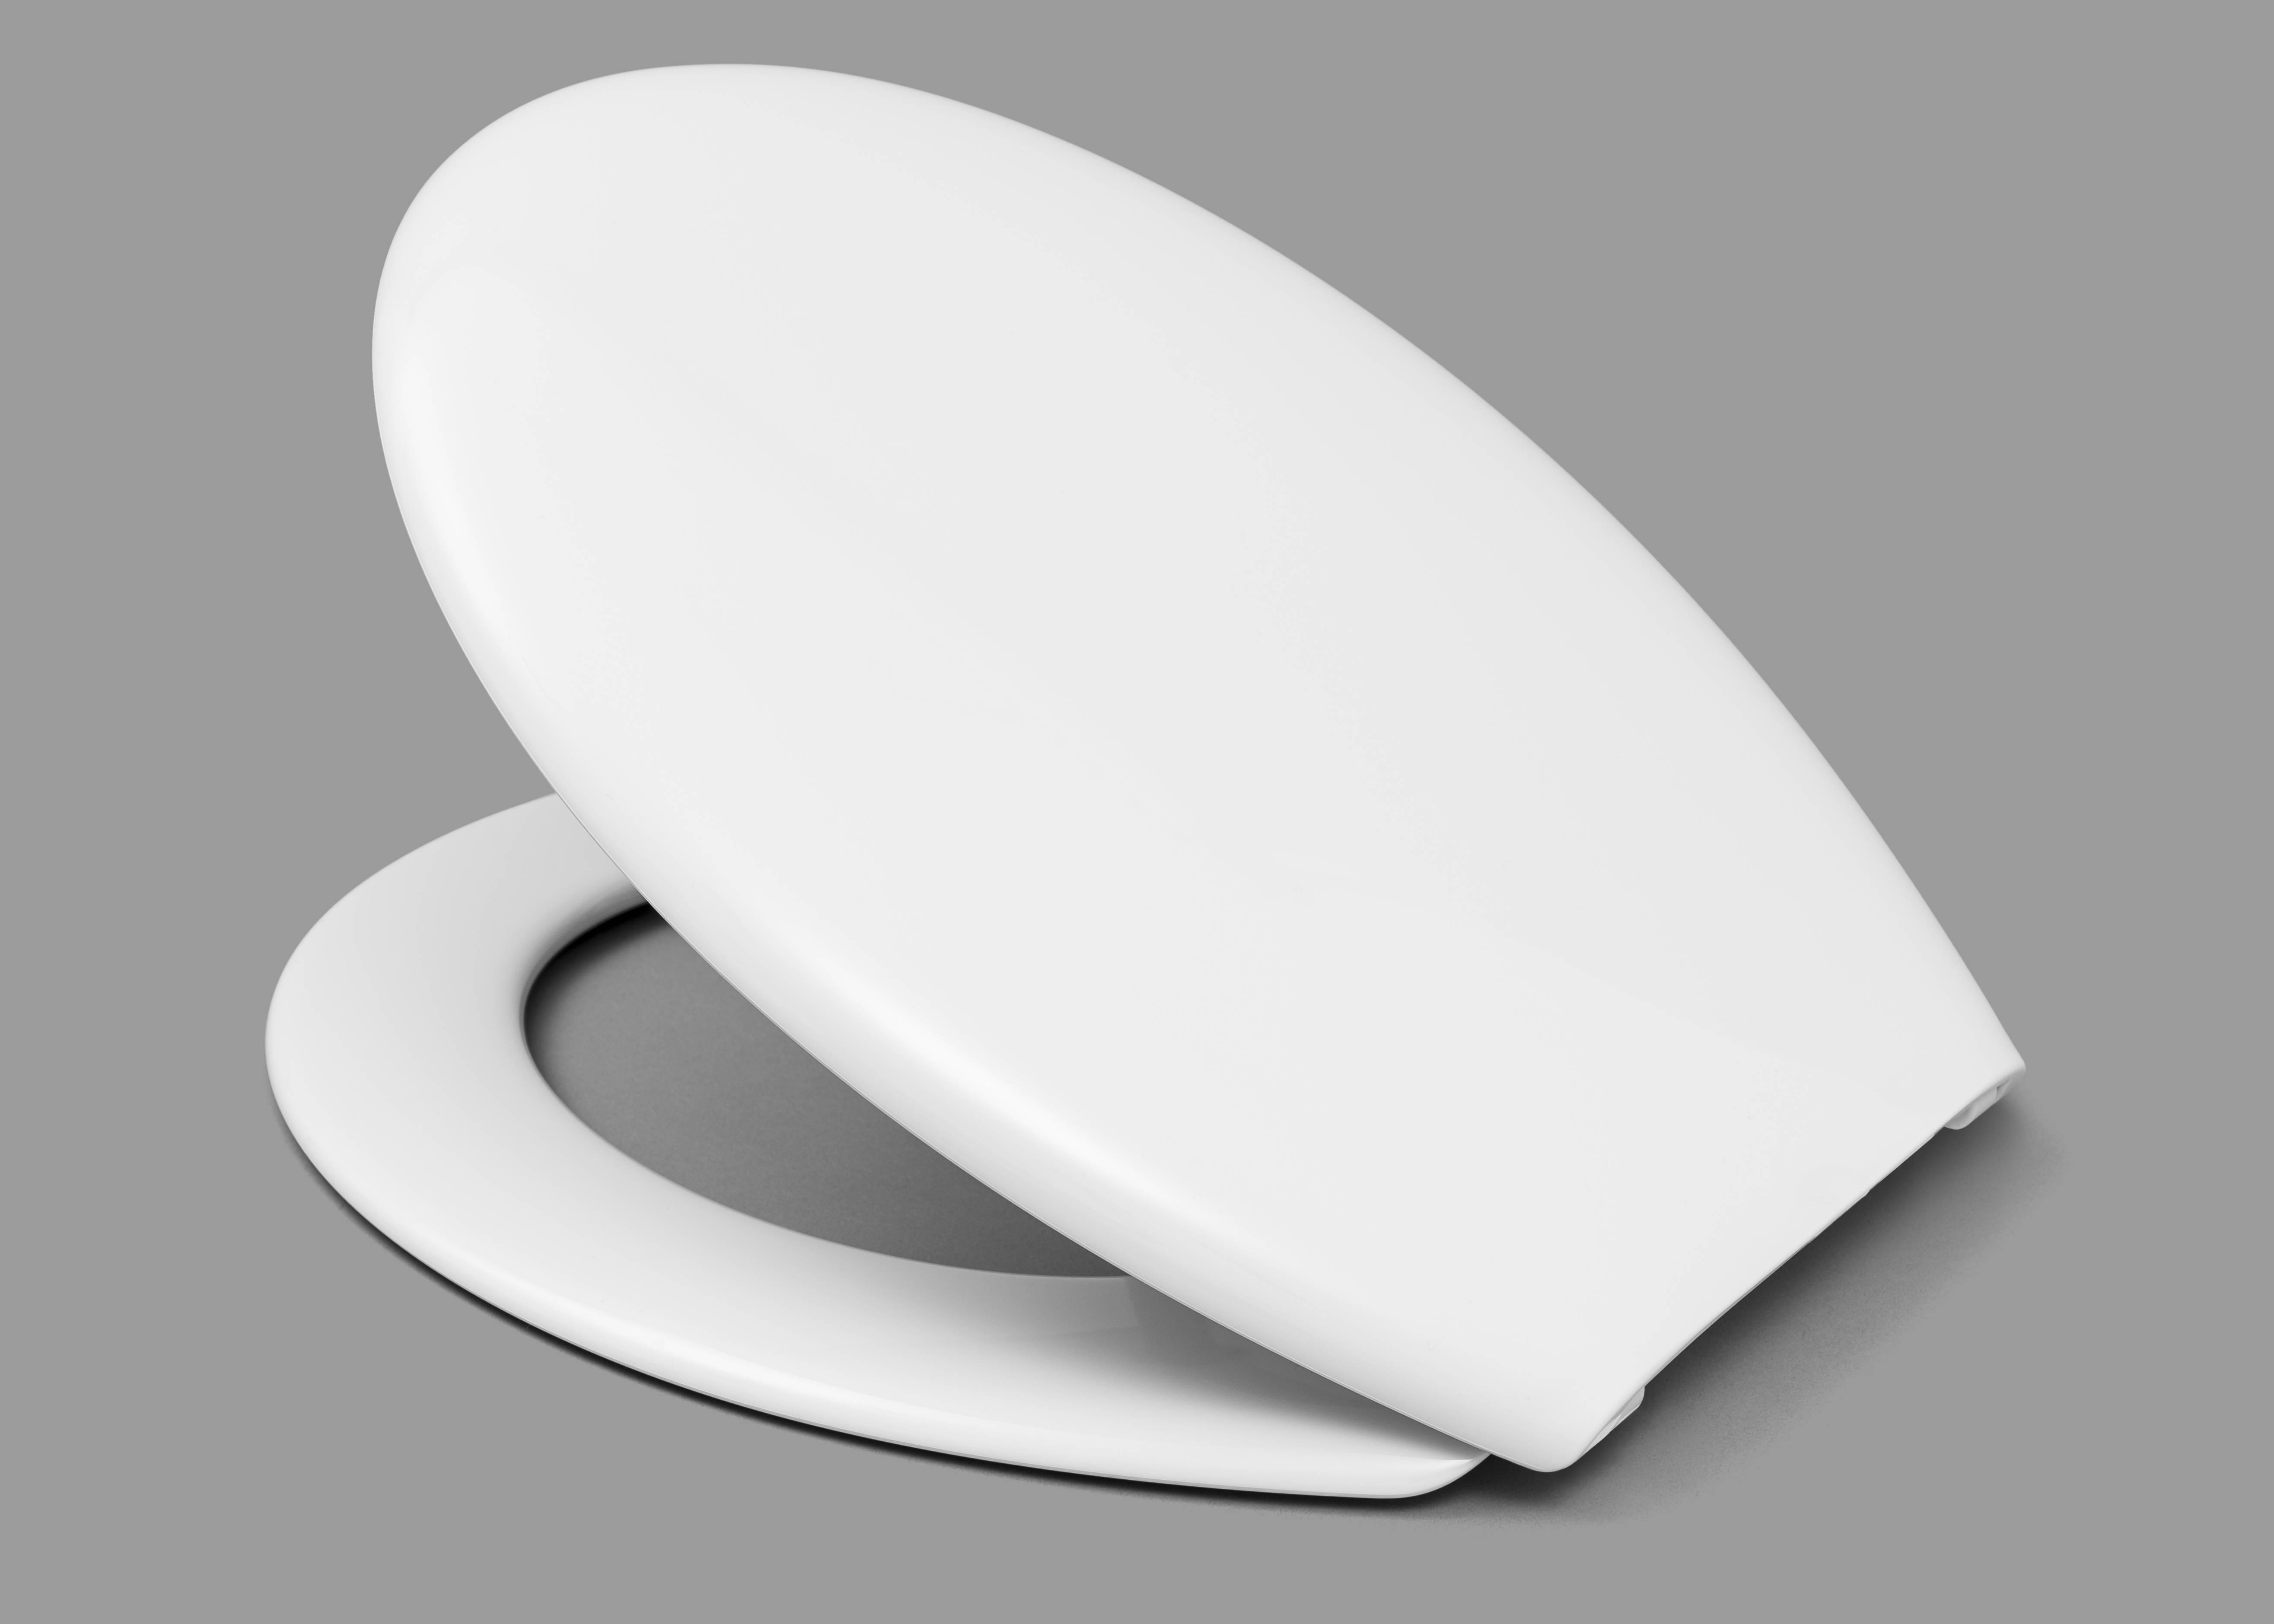 Capac WC HARO Thermoplast BERMUDA sistem inchidere din plastic